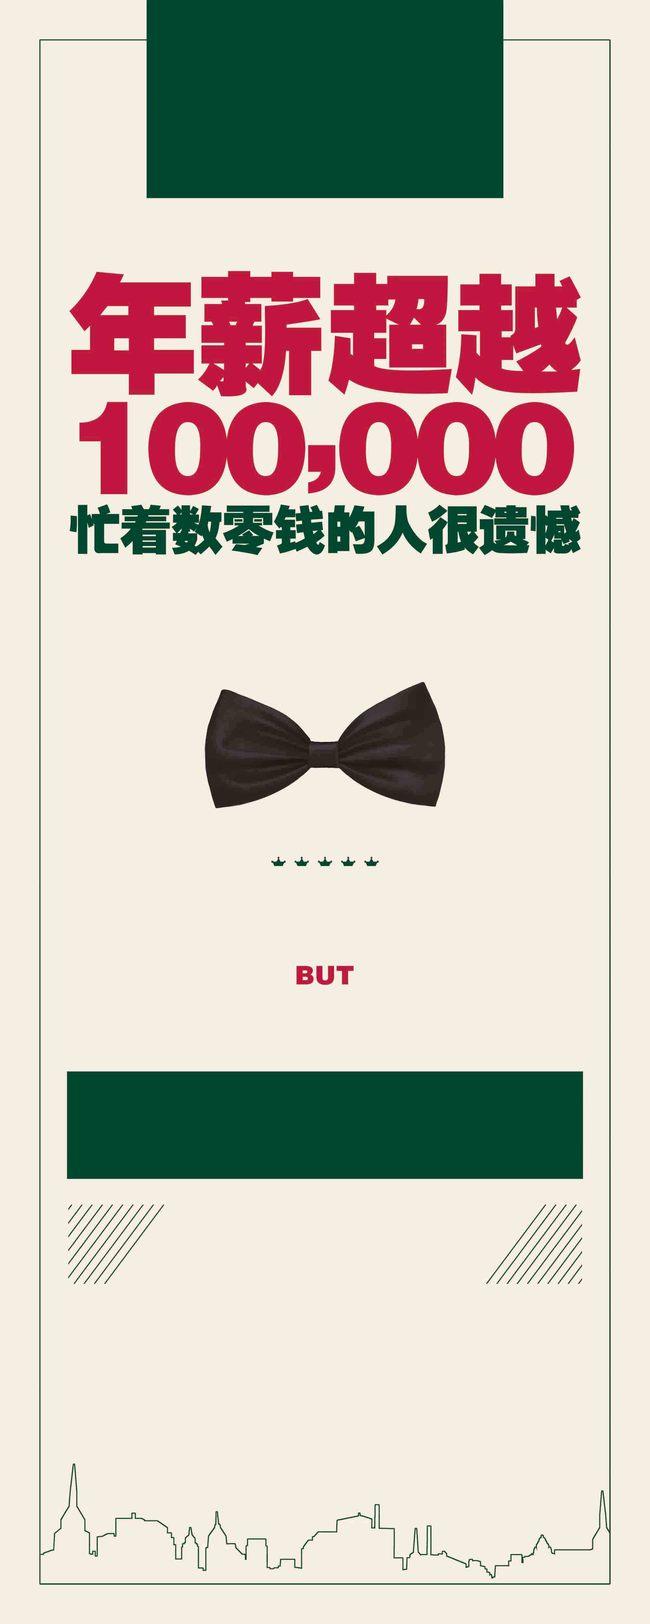 Bow Tie Necktie Sunglass Garment Background Object Symbol Heart